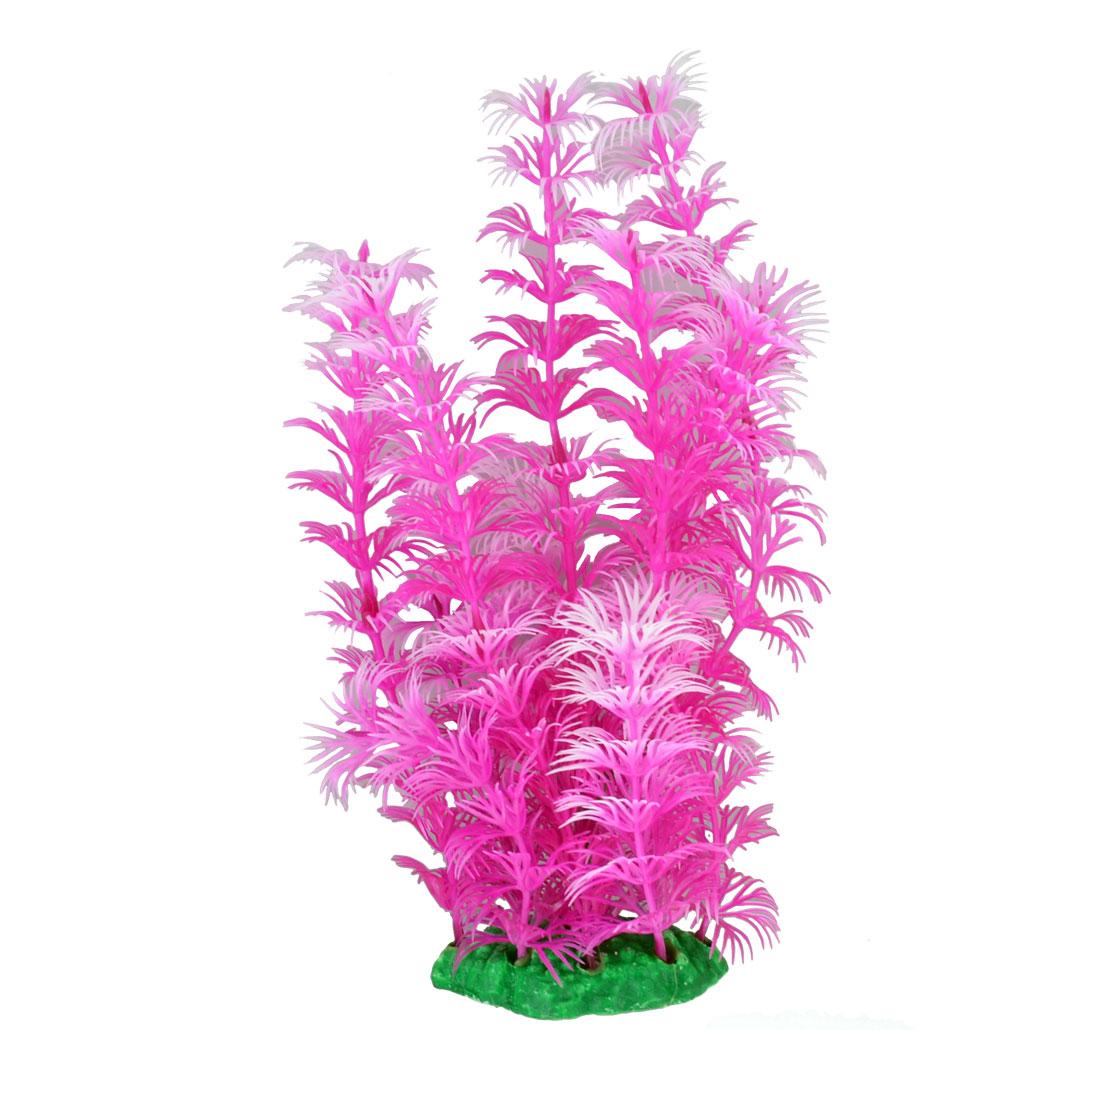 Fuchsia White Emulational Plastic Water Plants for Aquarium Fish Tank Ornament